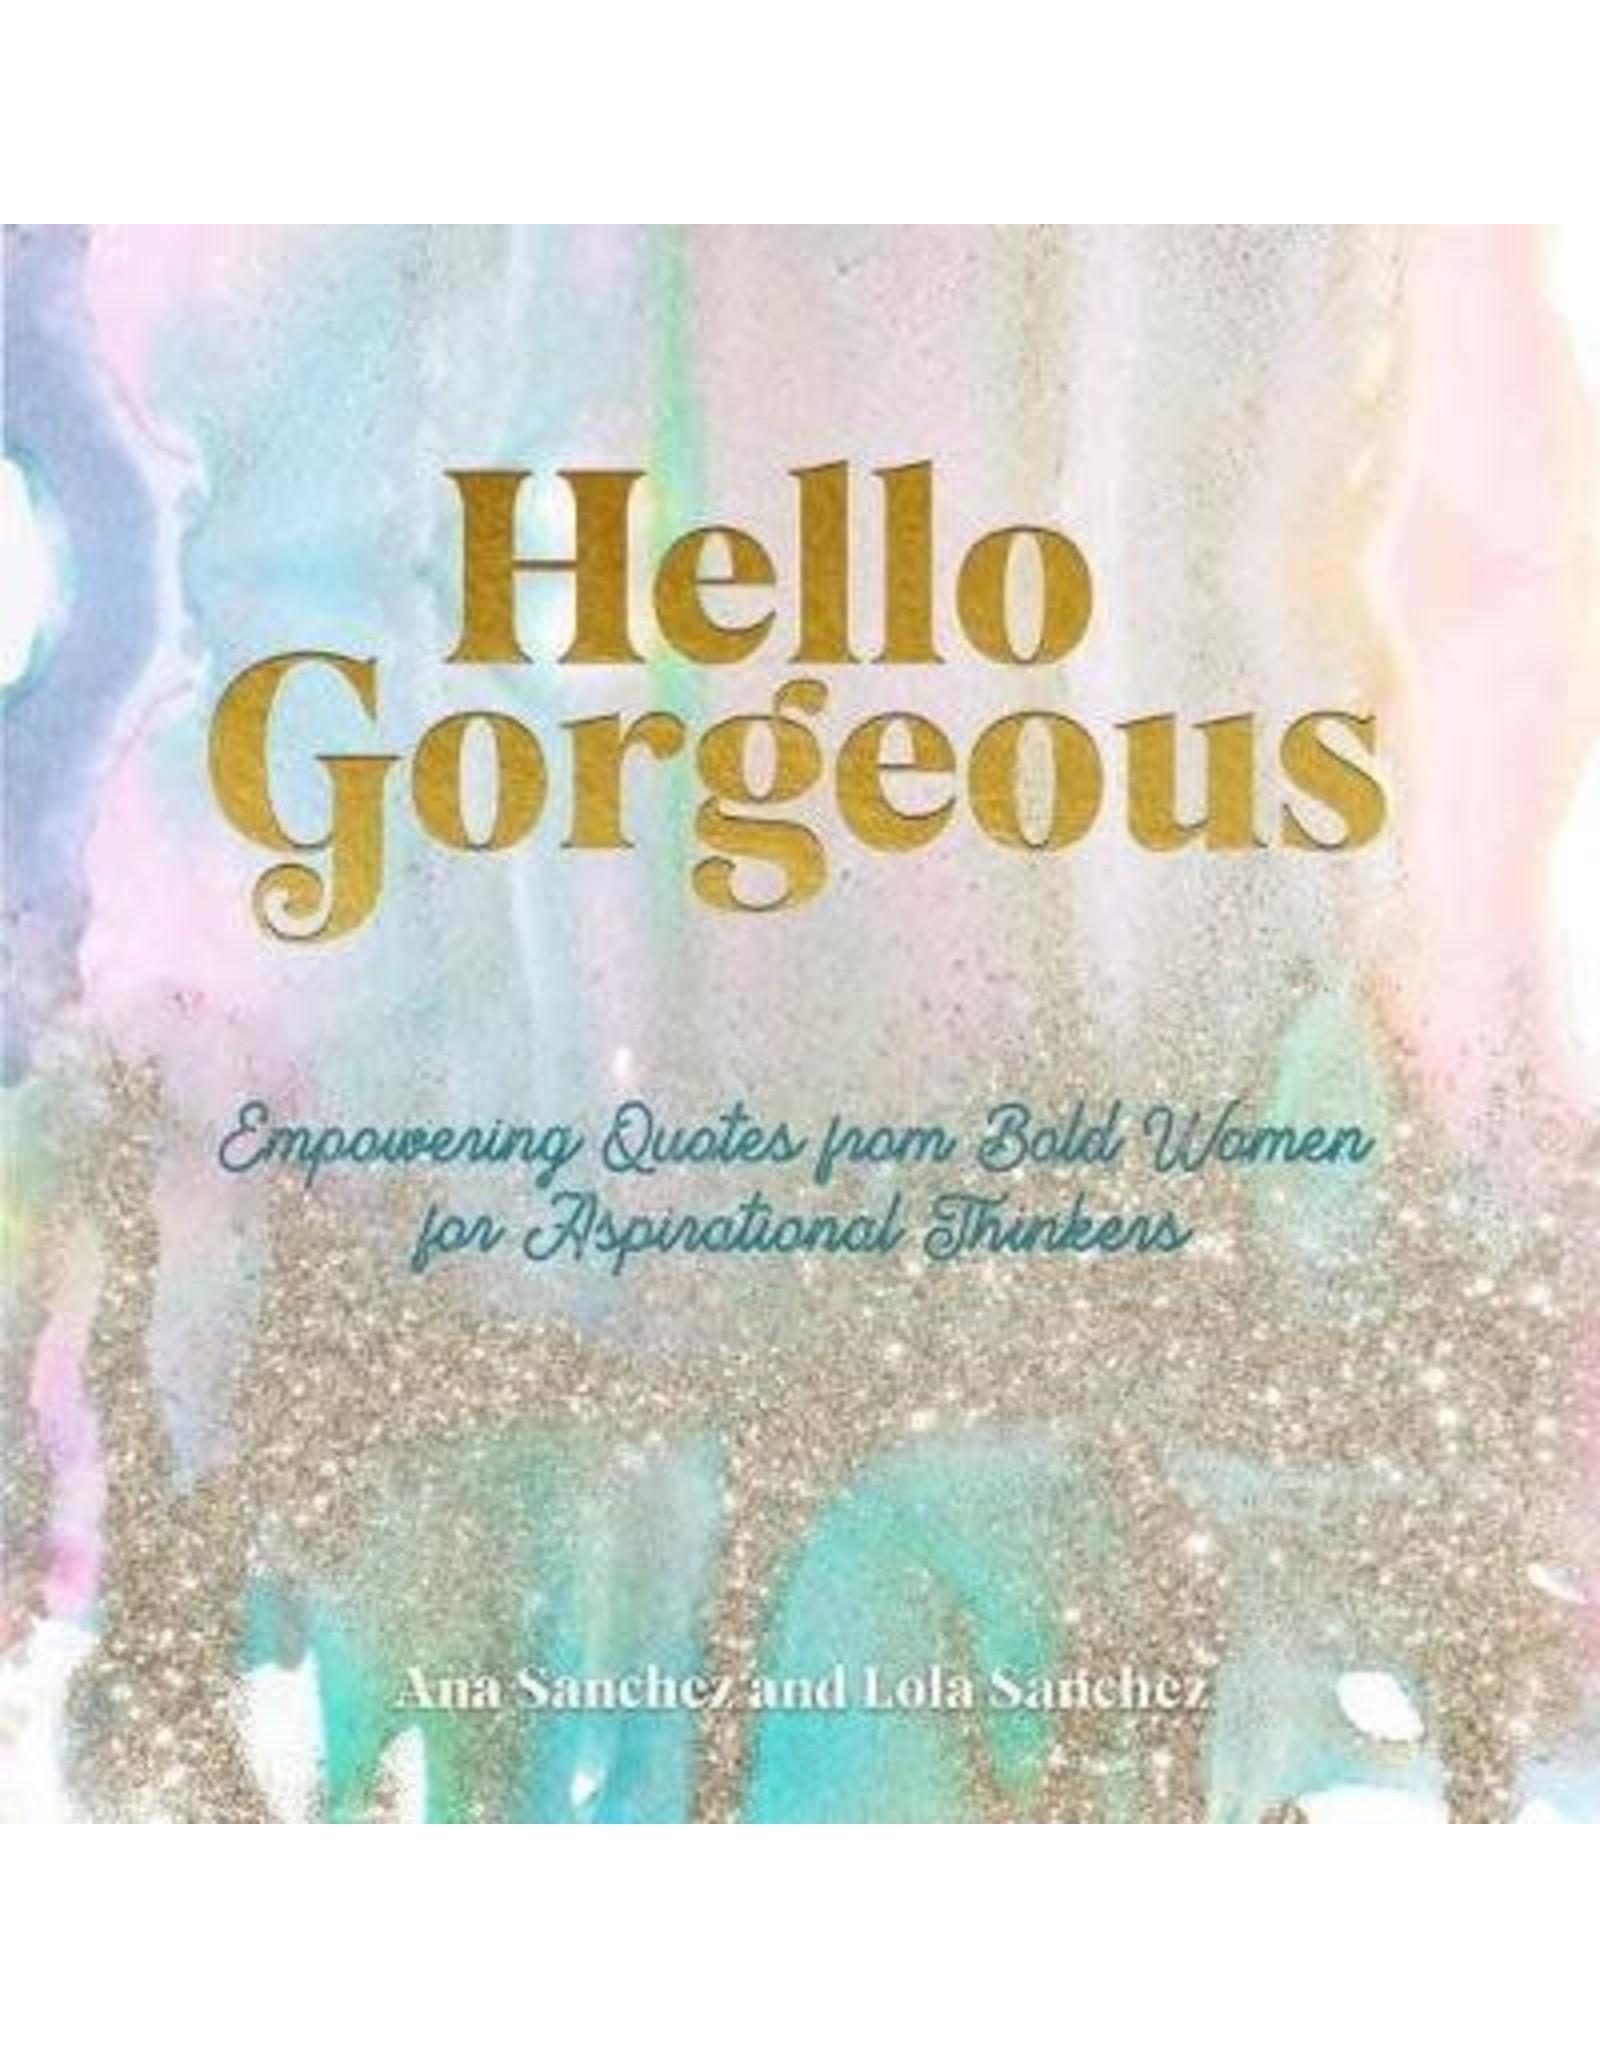 Hello Gorgeous by Ana & Lola Sanchez